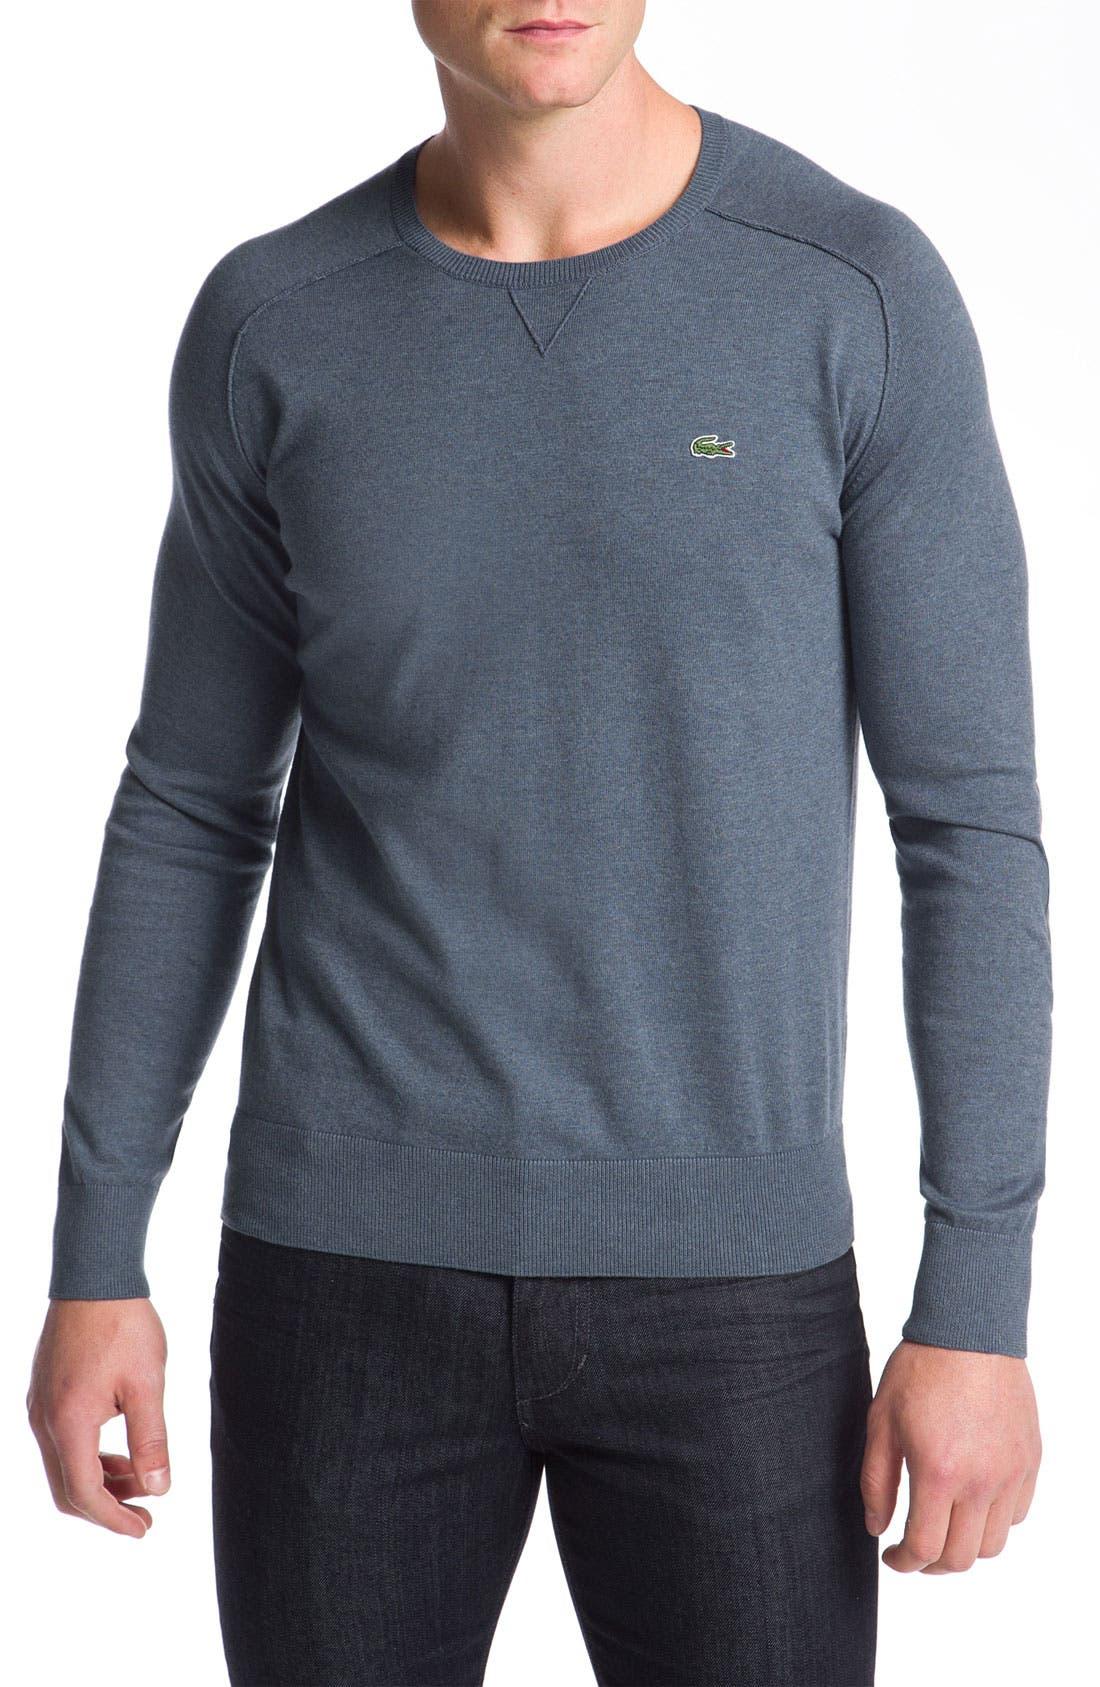 Alternate Image 1 Selected - Lacoste Cotton & Cashmere Crewneck Sweater